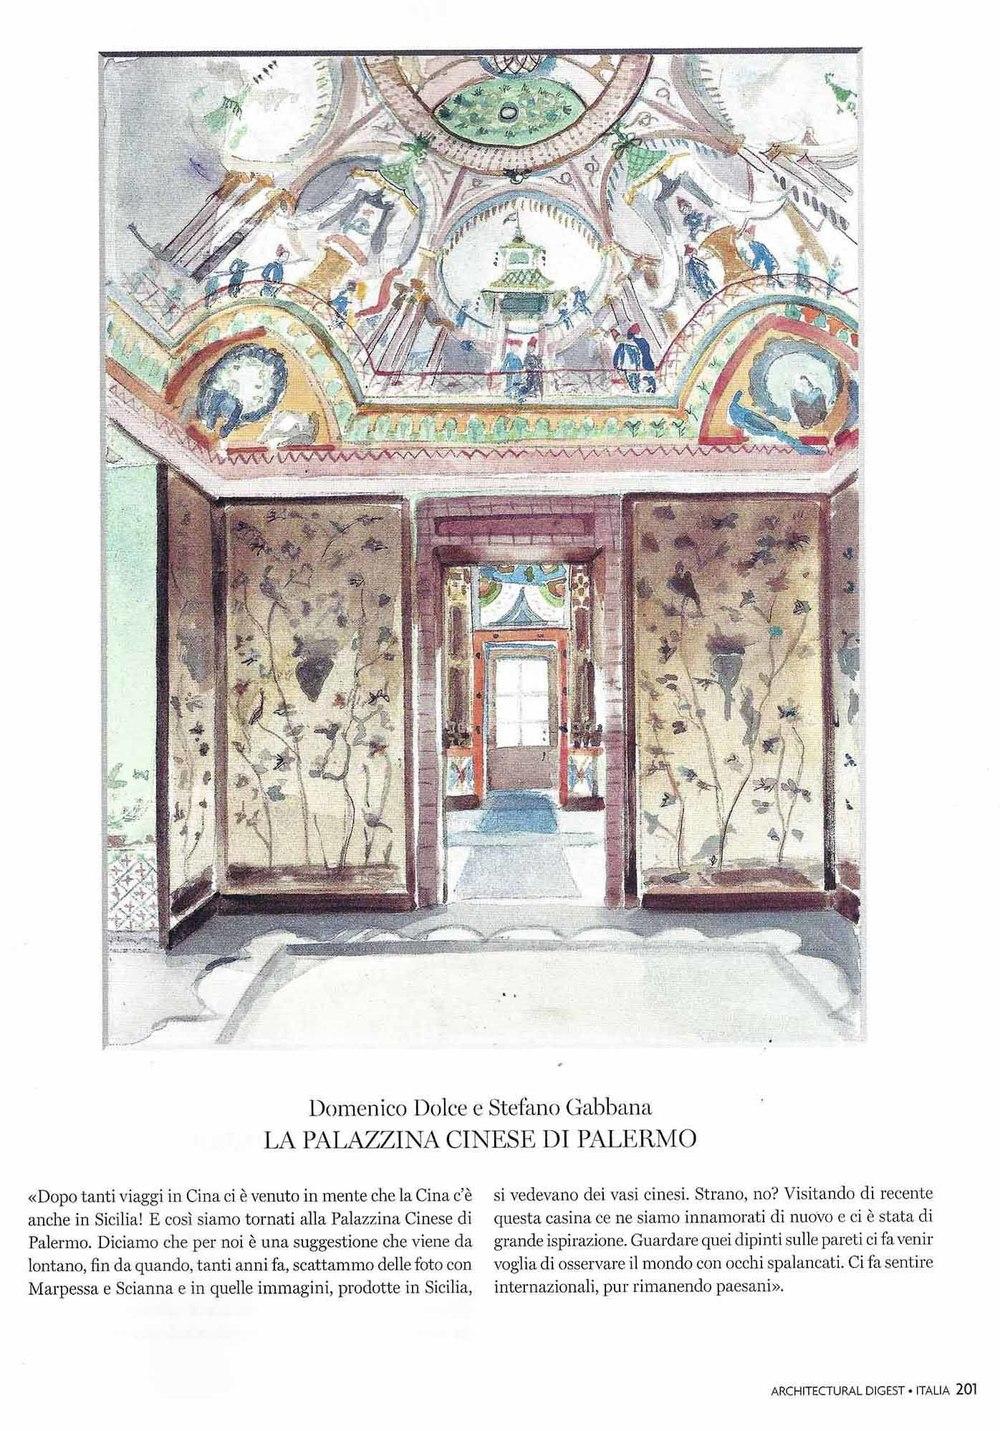 Domenico Dolce & Stefano Gabbana - La Palazzina Cinese